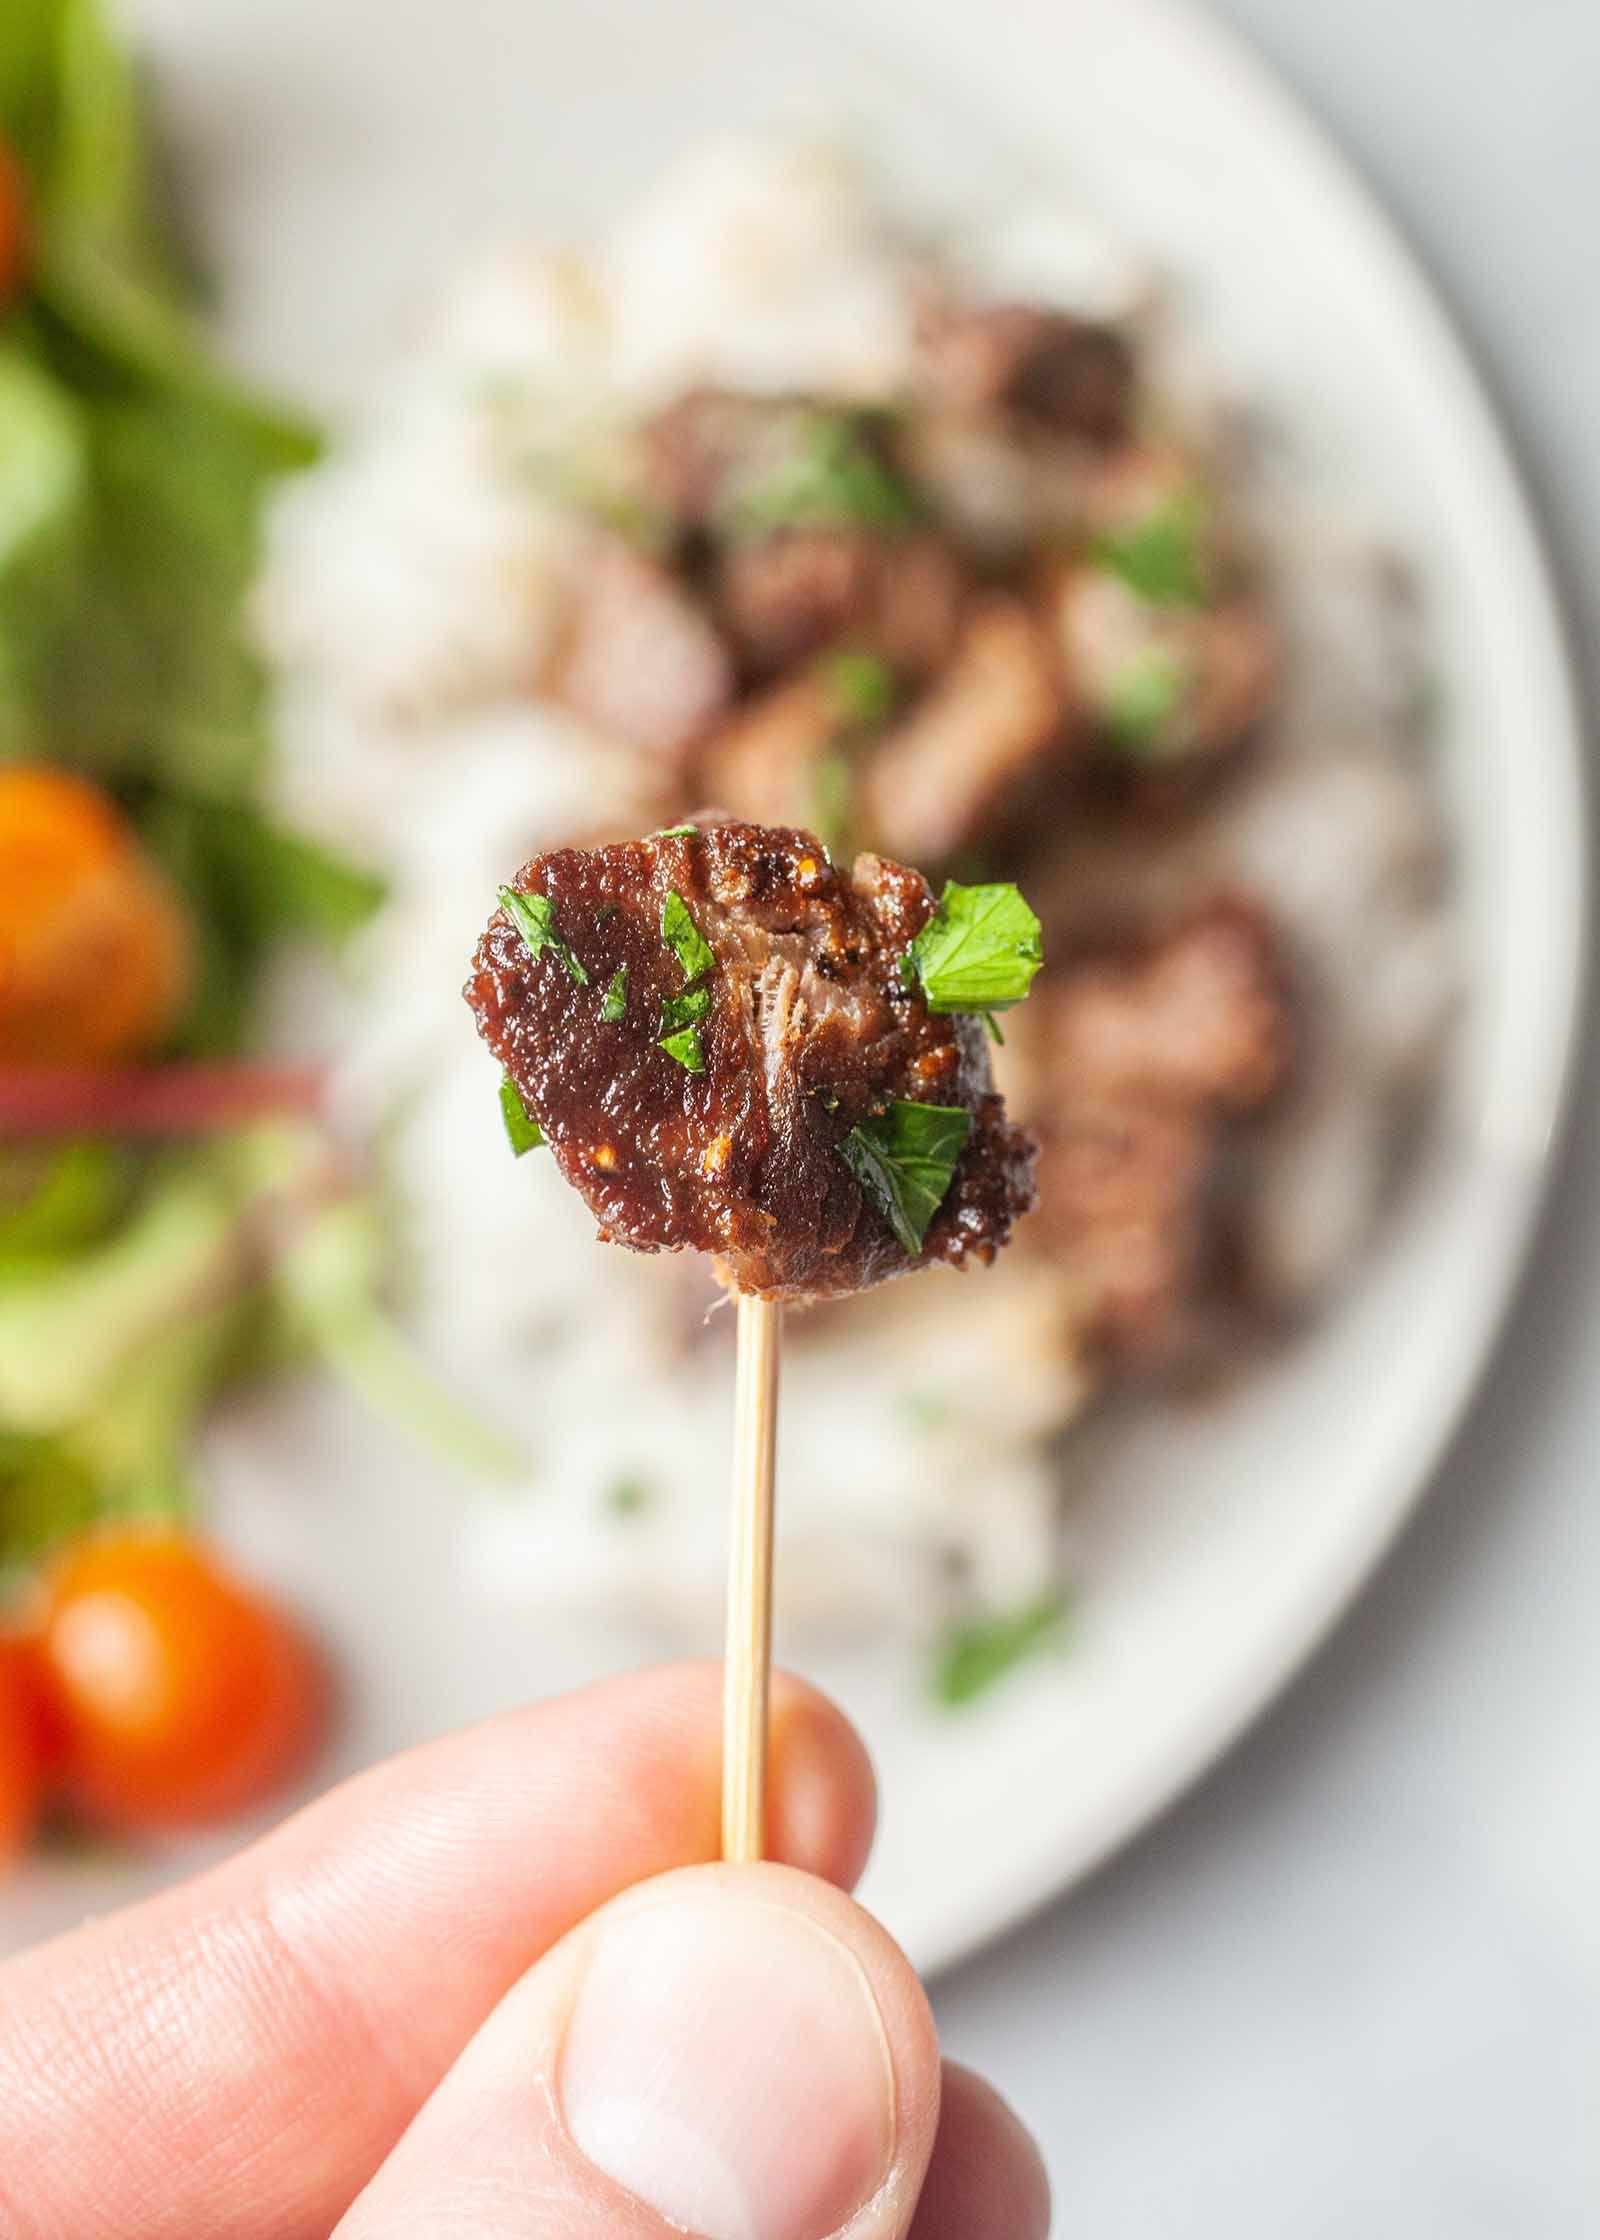 Best Steak Bites Recipe